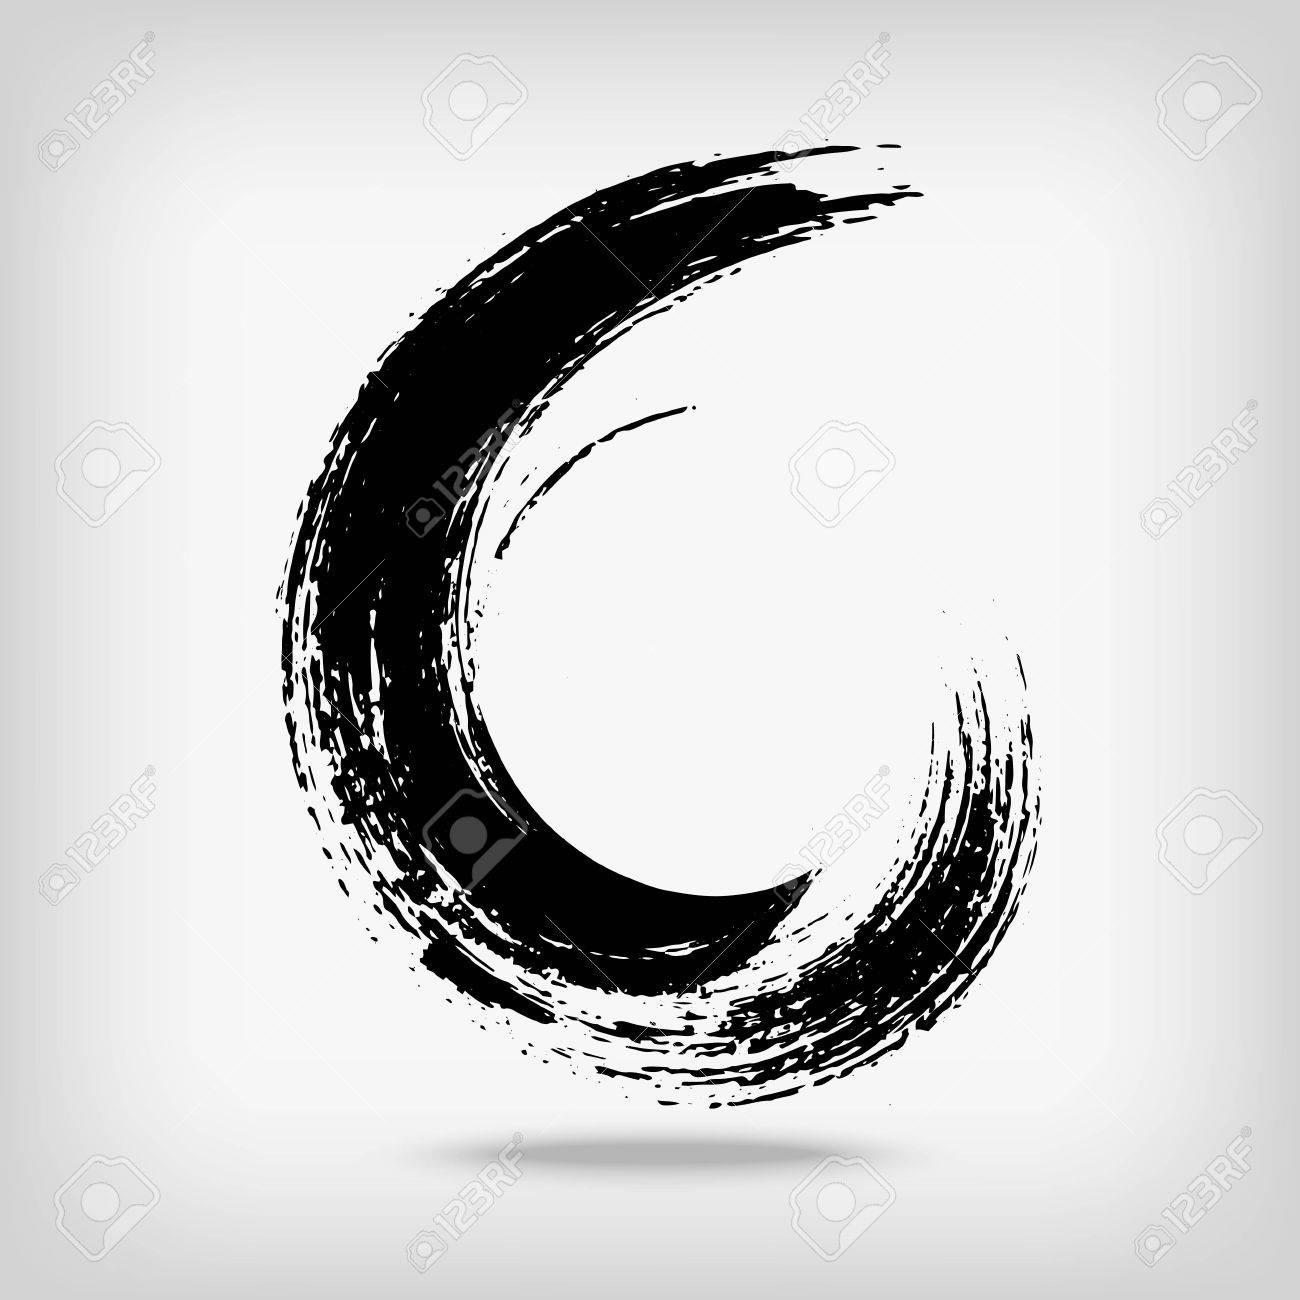 Artistic creative painted circle for logo, label, branding. Black enso zen round. Vector illustration. - 67556621